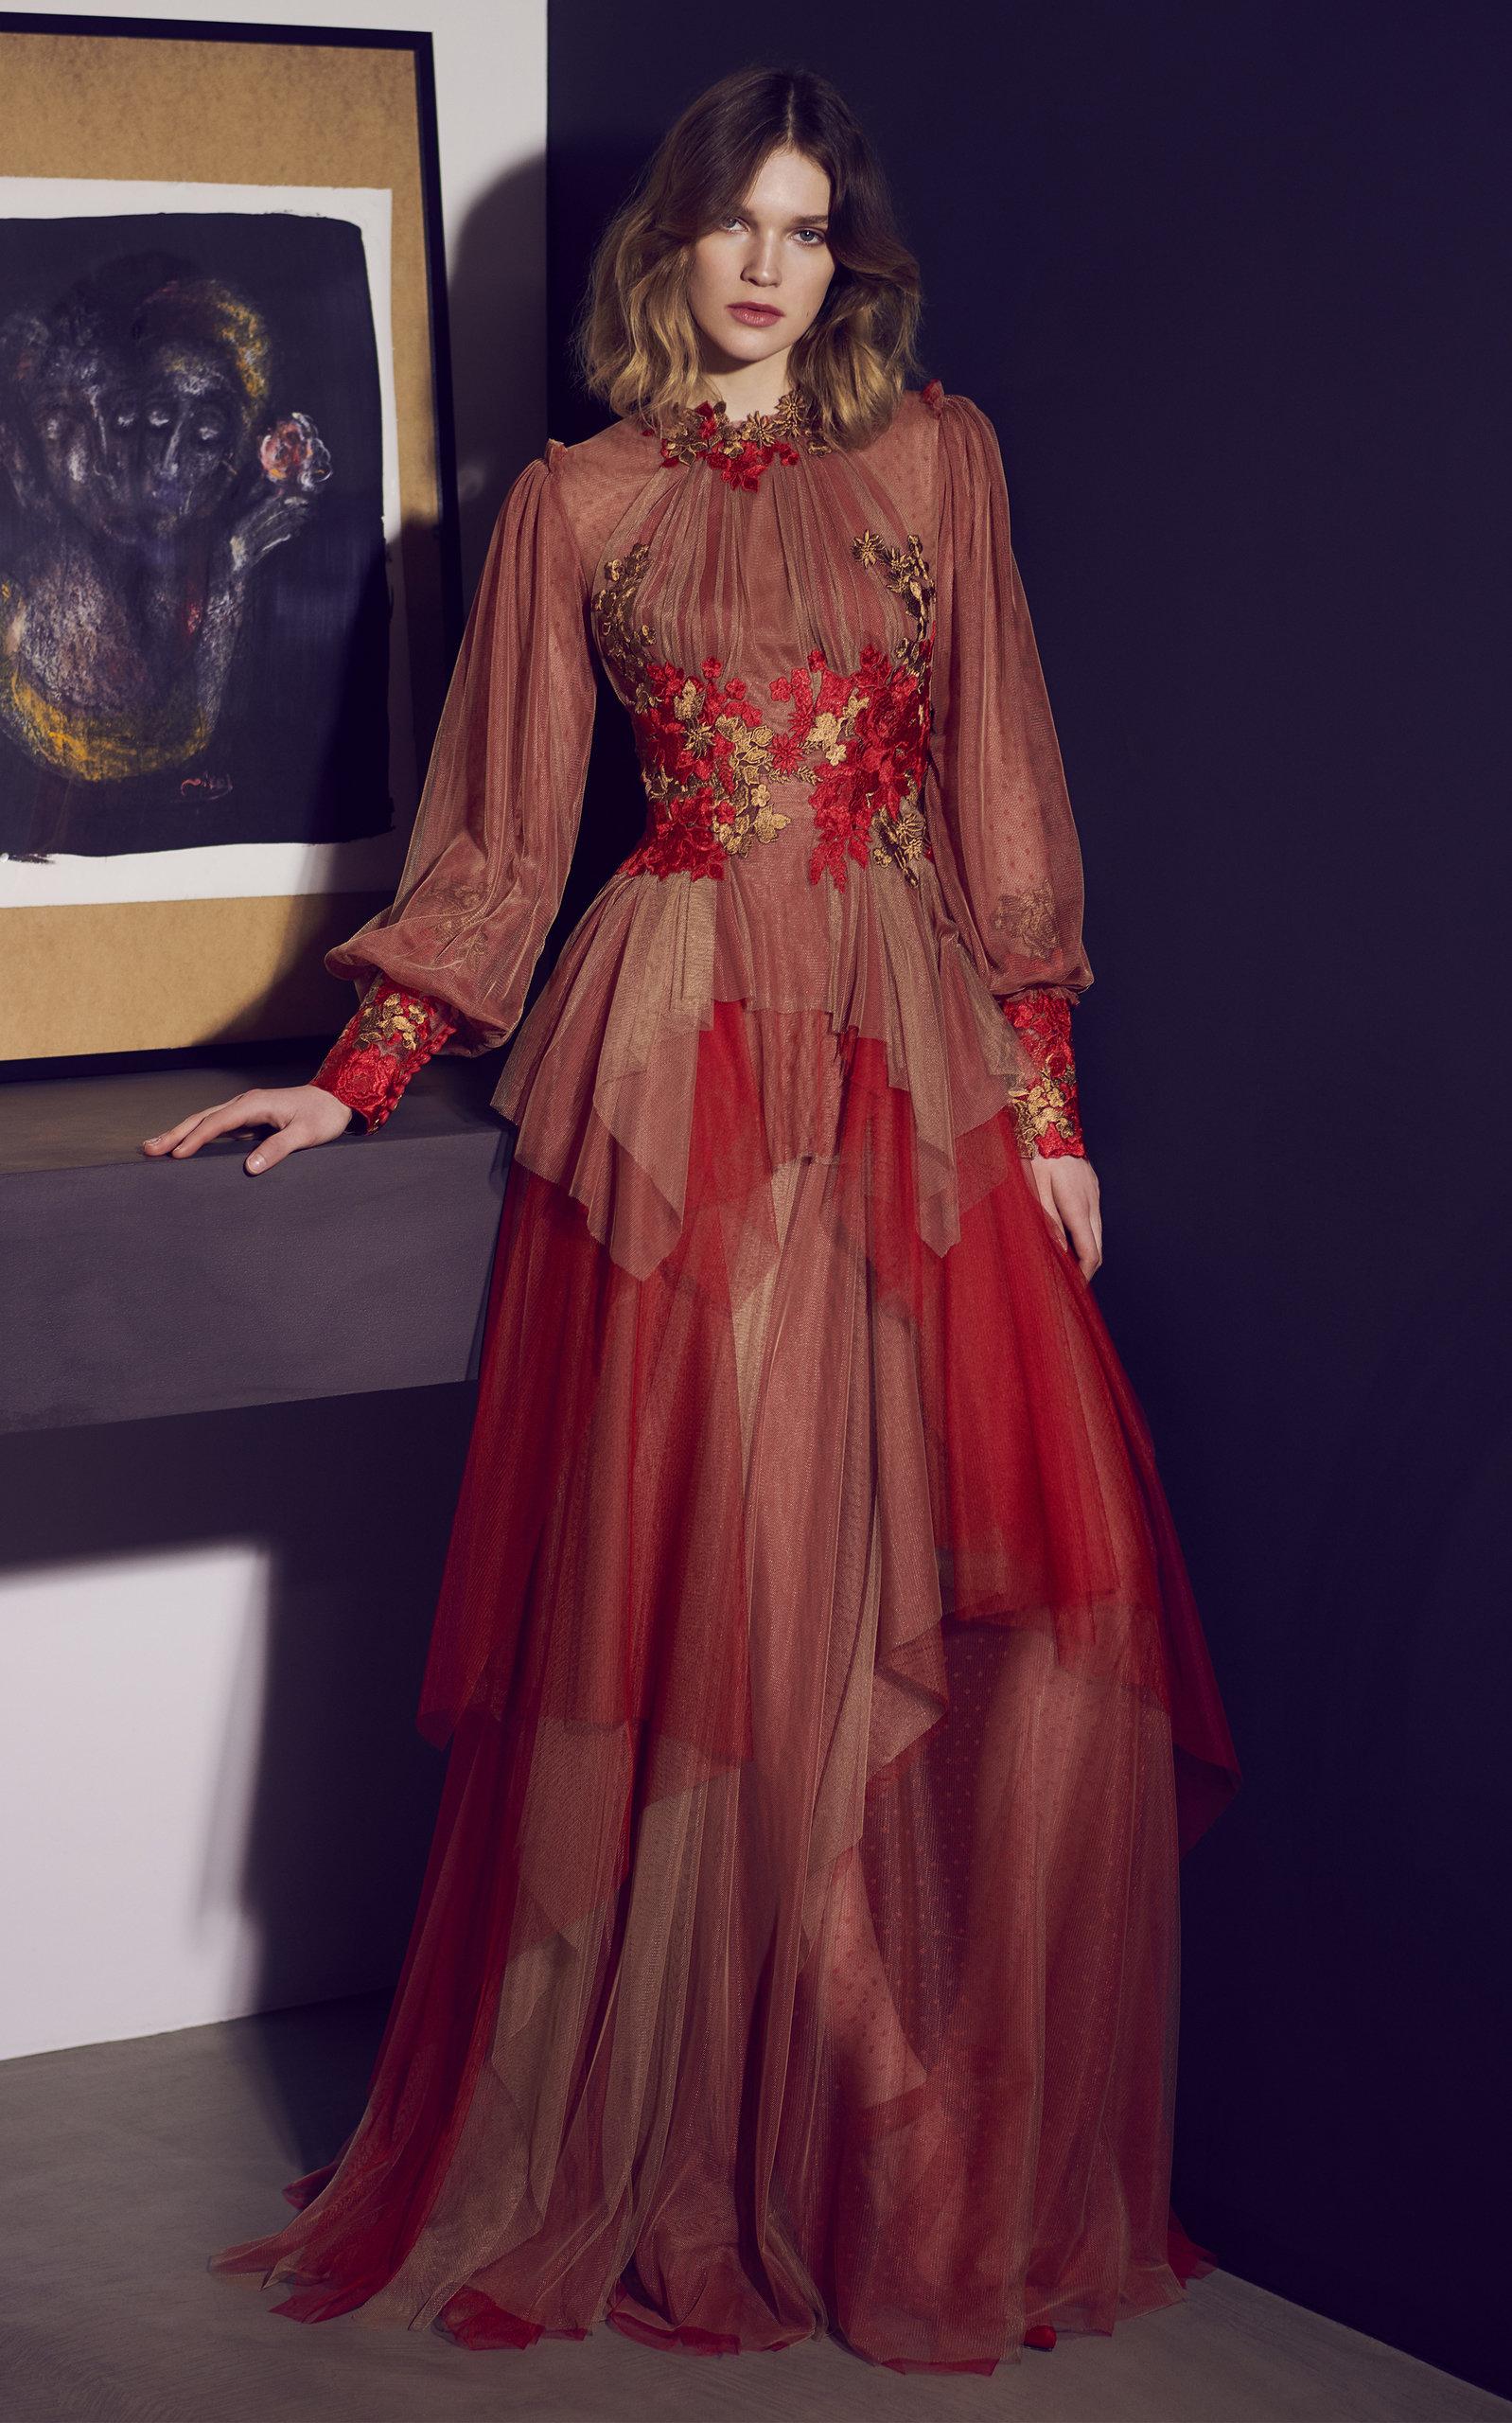 Costarellos Dresses Draped Floral-Appliquéd Tulle Gown